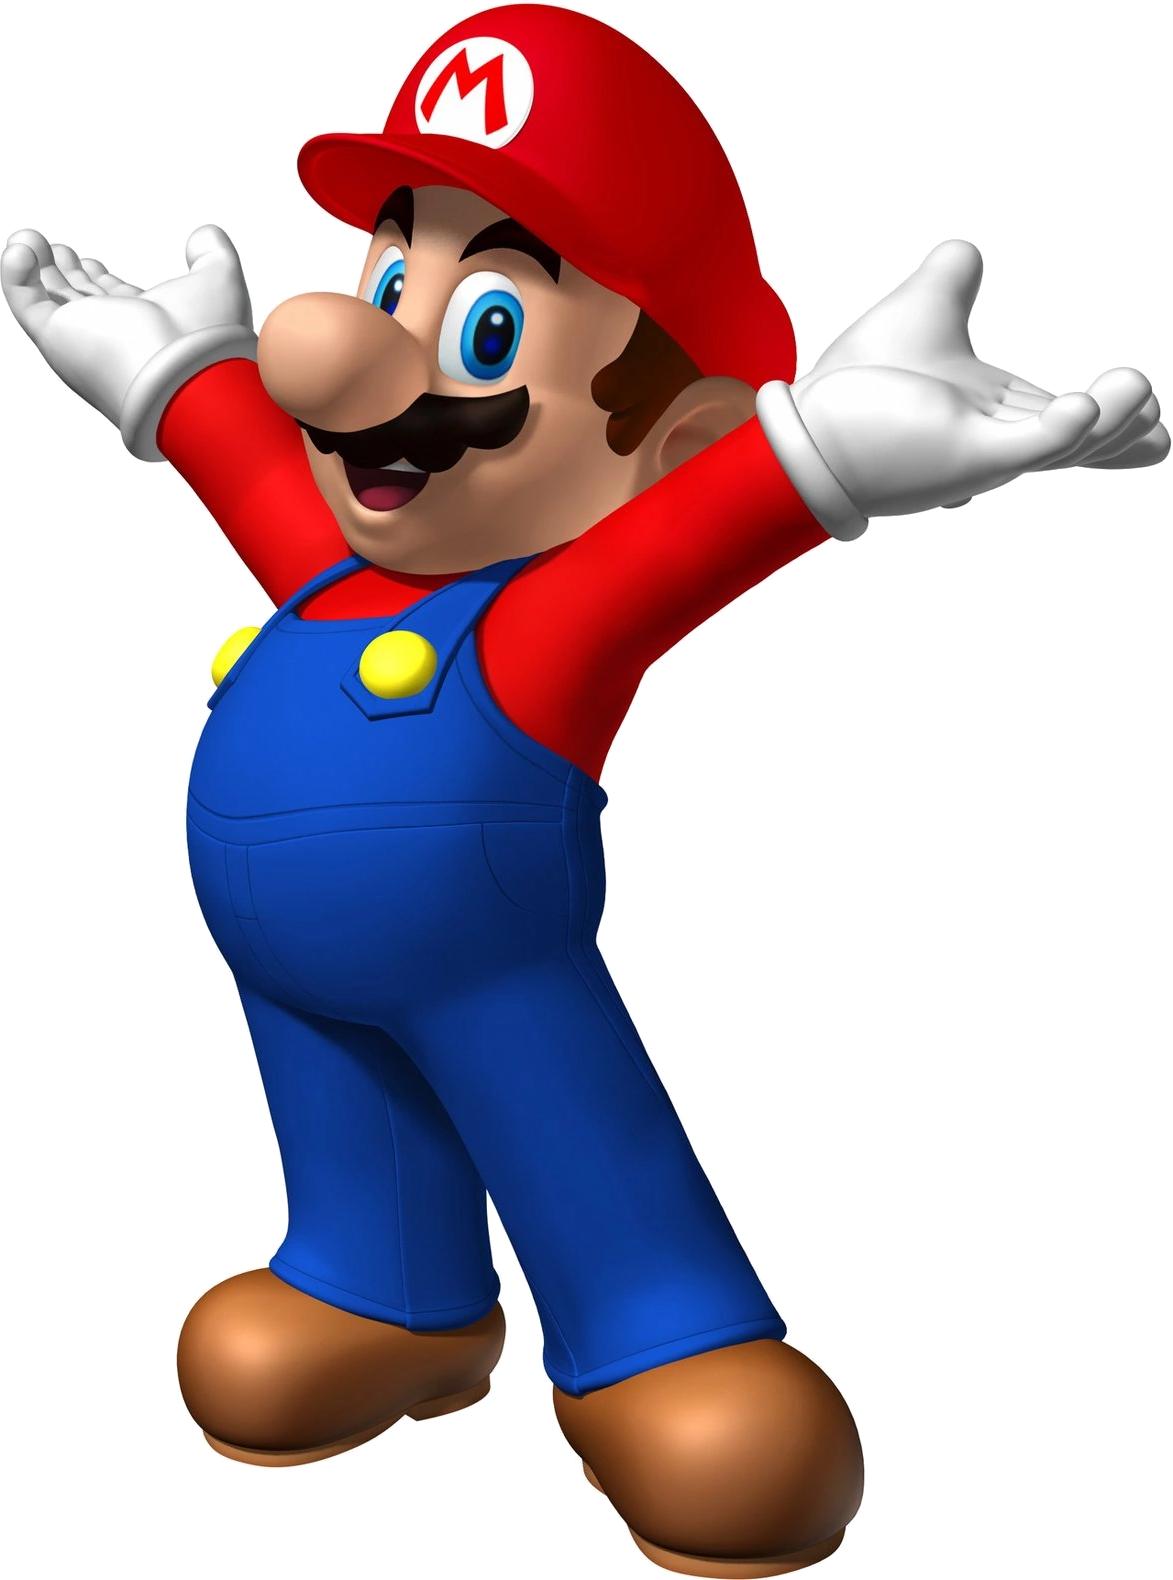 Mario PNG Image